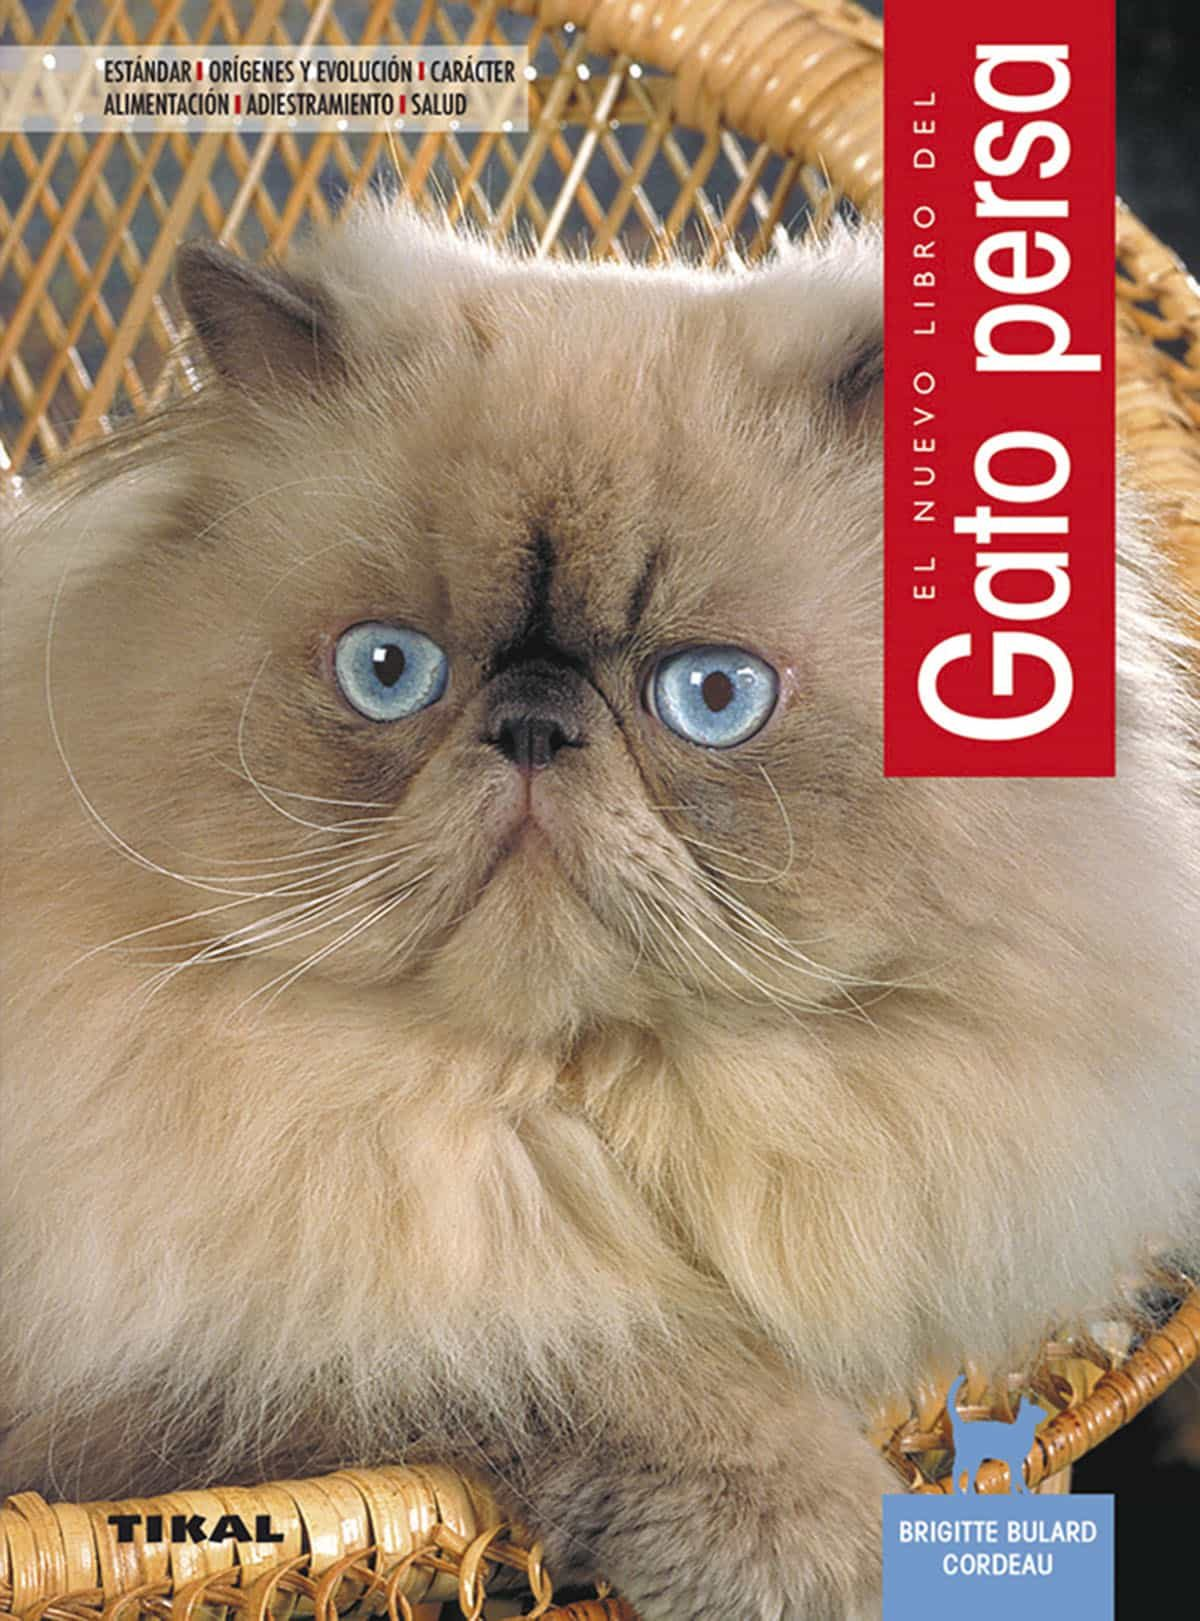 Gato Persa - Cordeau Brigitte Bulard